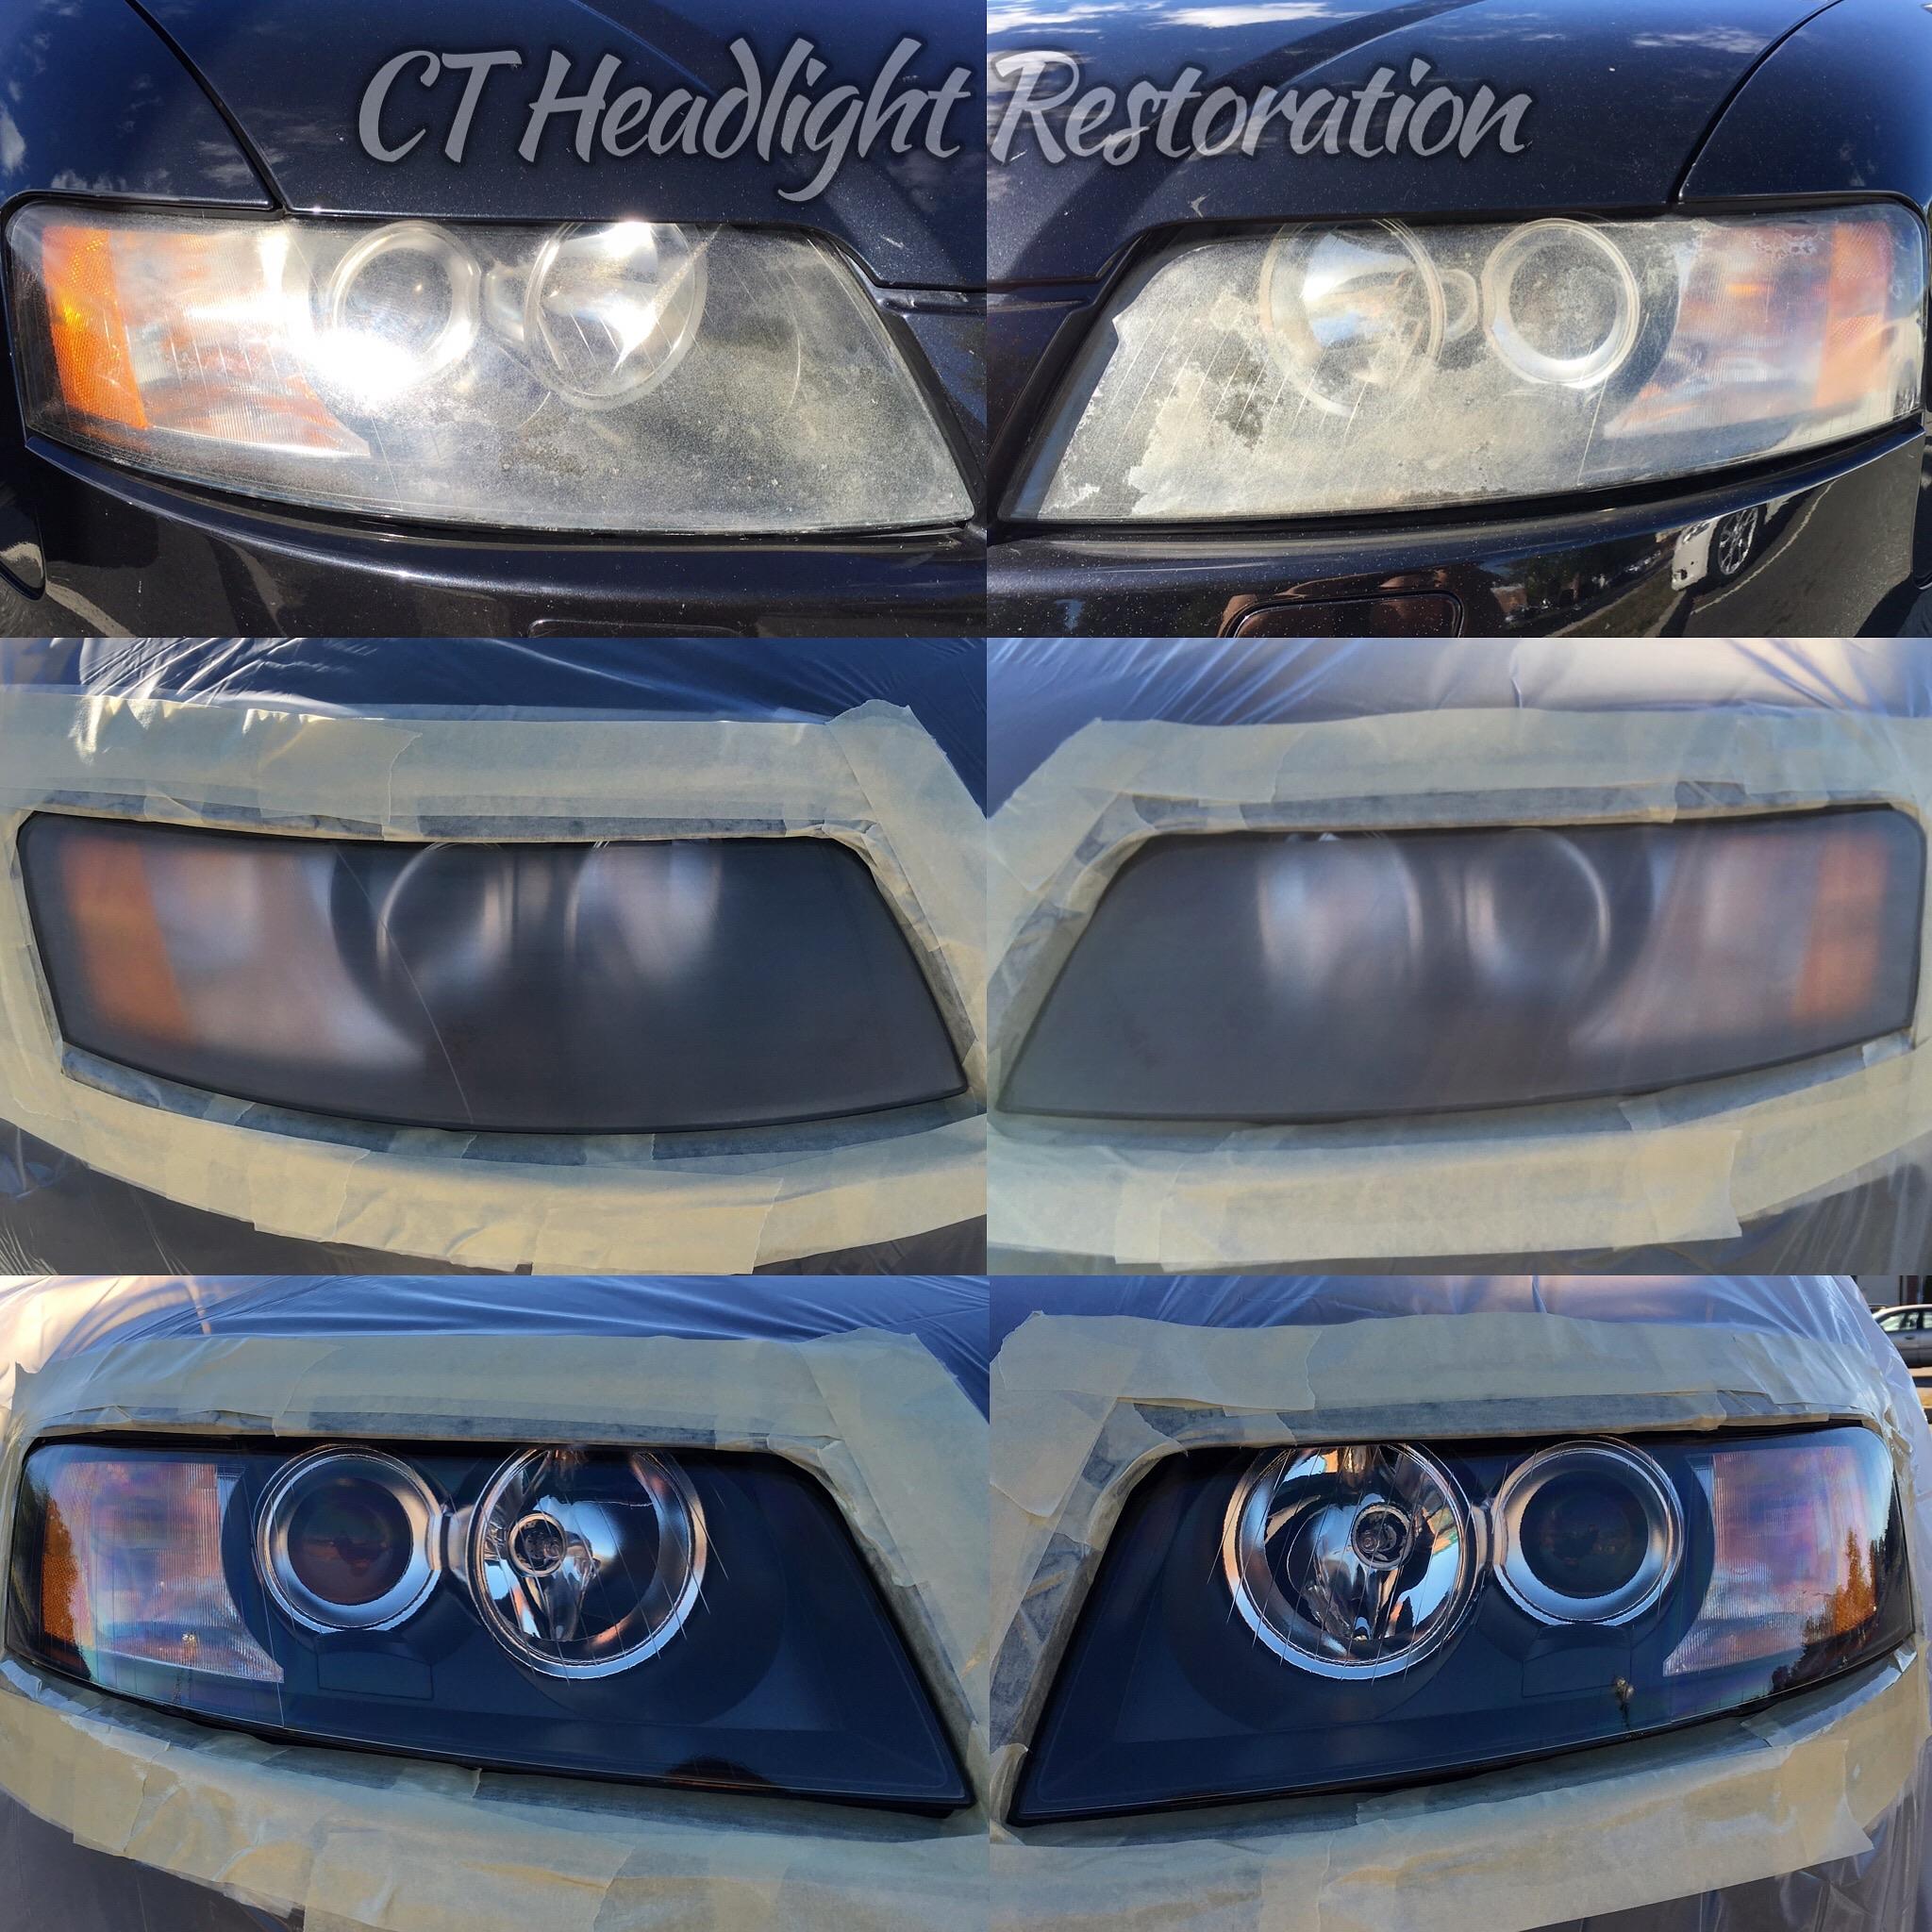 Audi S4 CT Headlight Restoration Best.jpg